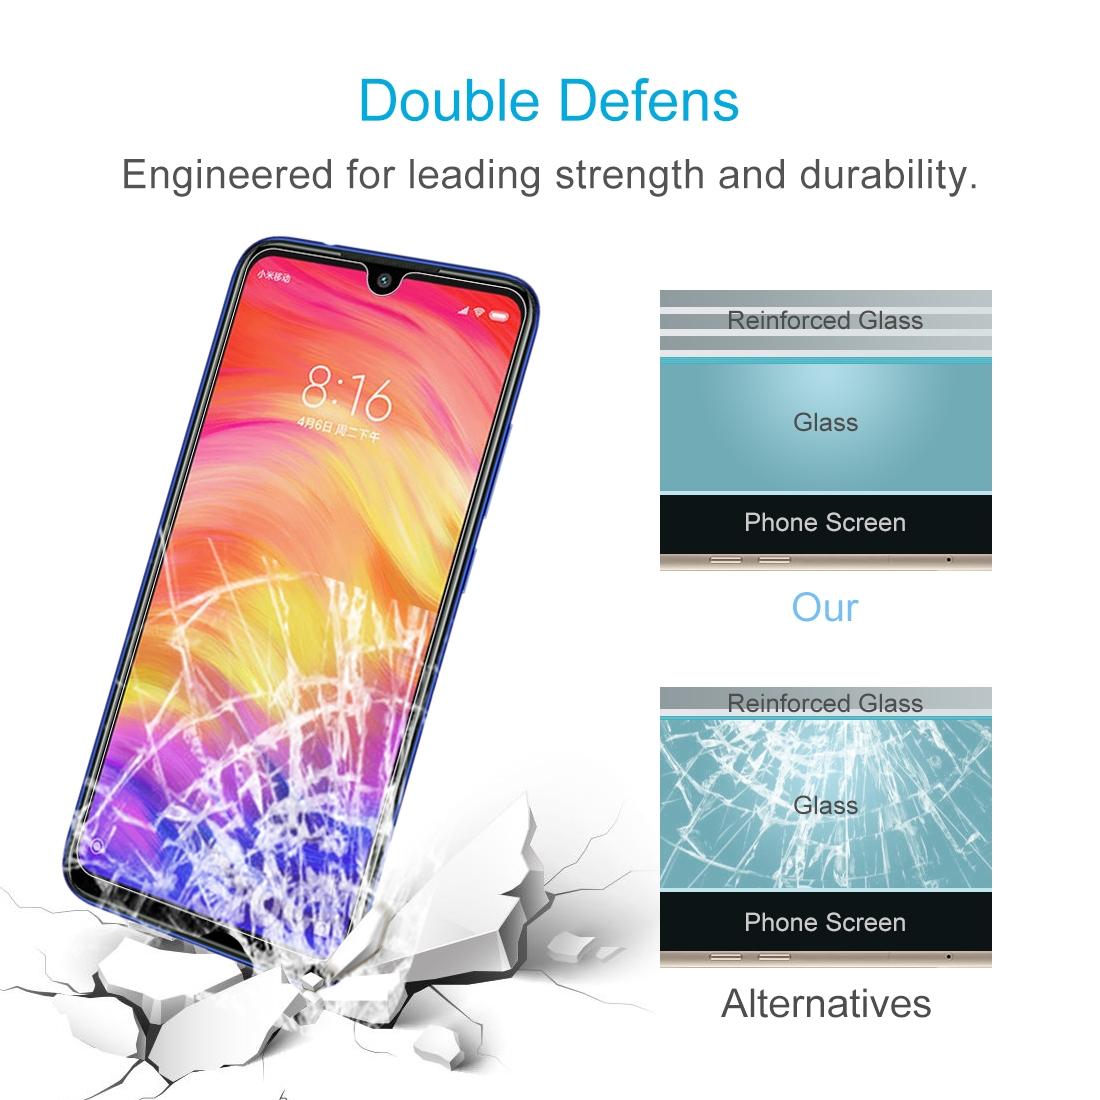 full-glass-lcd-protector-xiaomi-redmi7-محافظ-صفحه-نمایش-فول-گلس-تمام_چسب-شیائومی-ردمی-سون.jpg